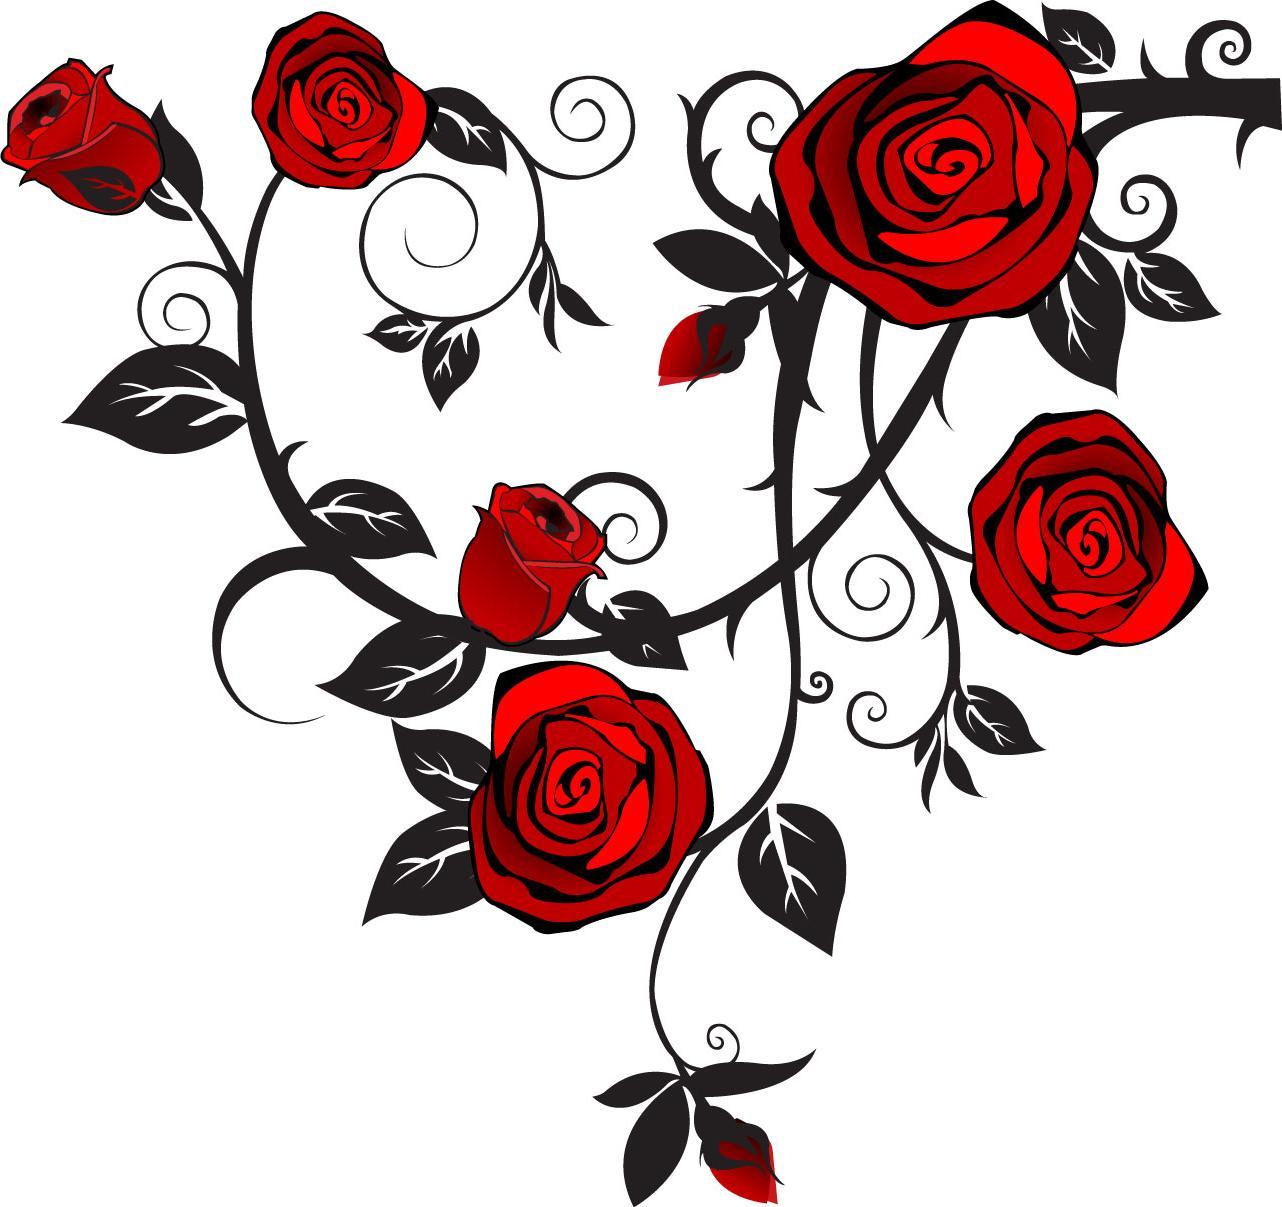 Rosevine clipart svg royalty free download Rose Vine Clip Art | Free download best Rose Vine Clip Art ... svg royalty free download